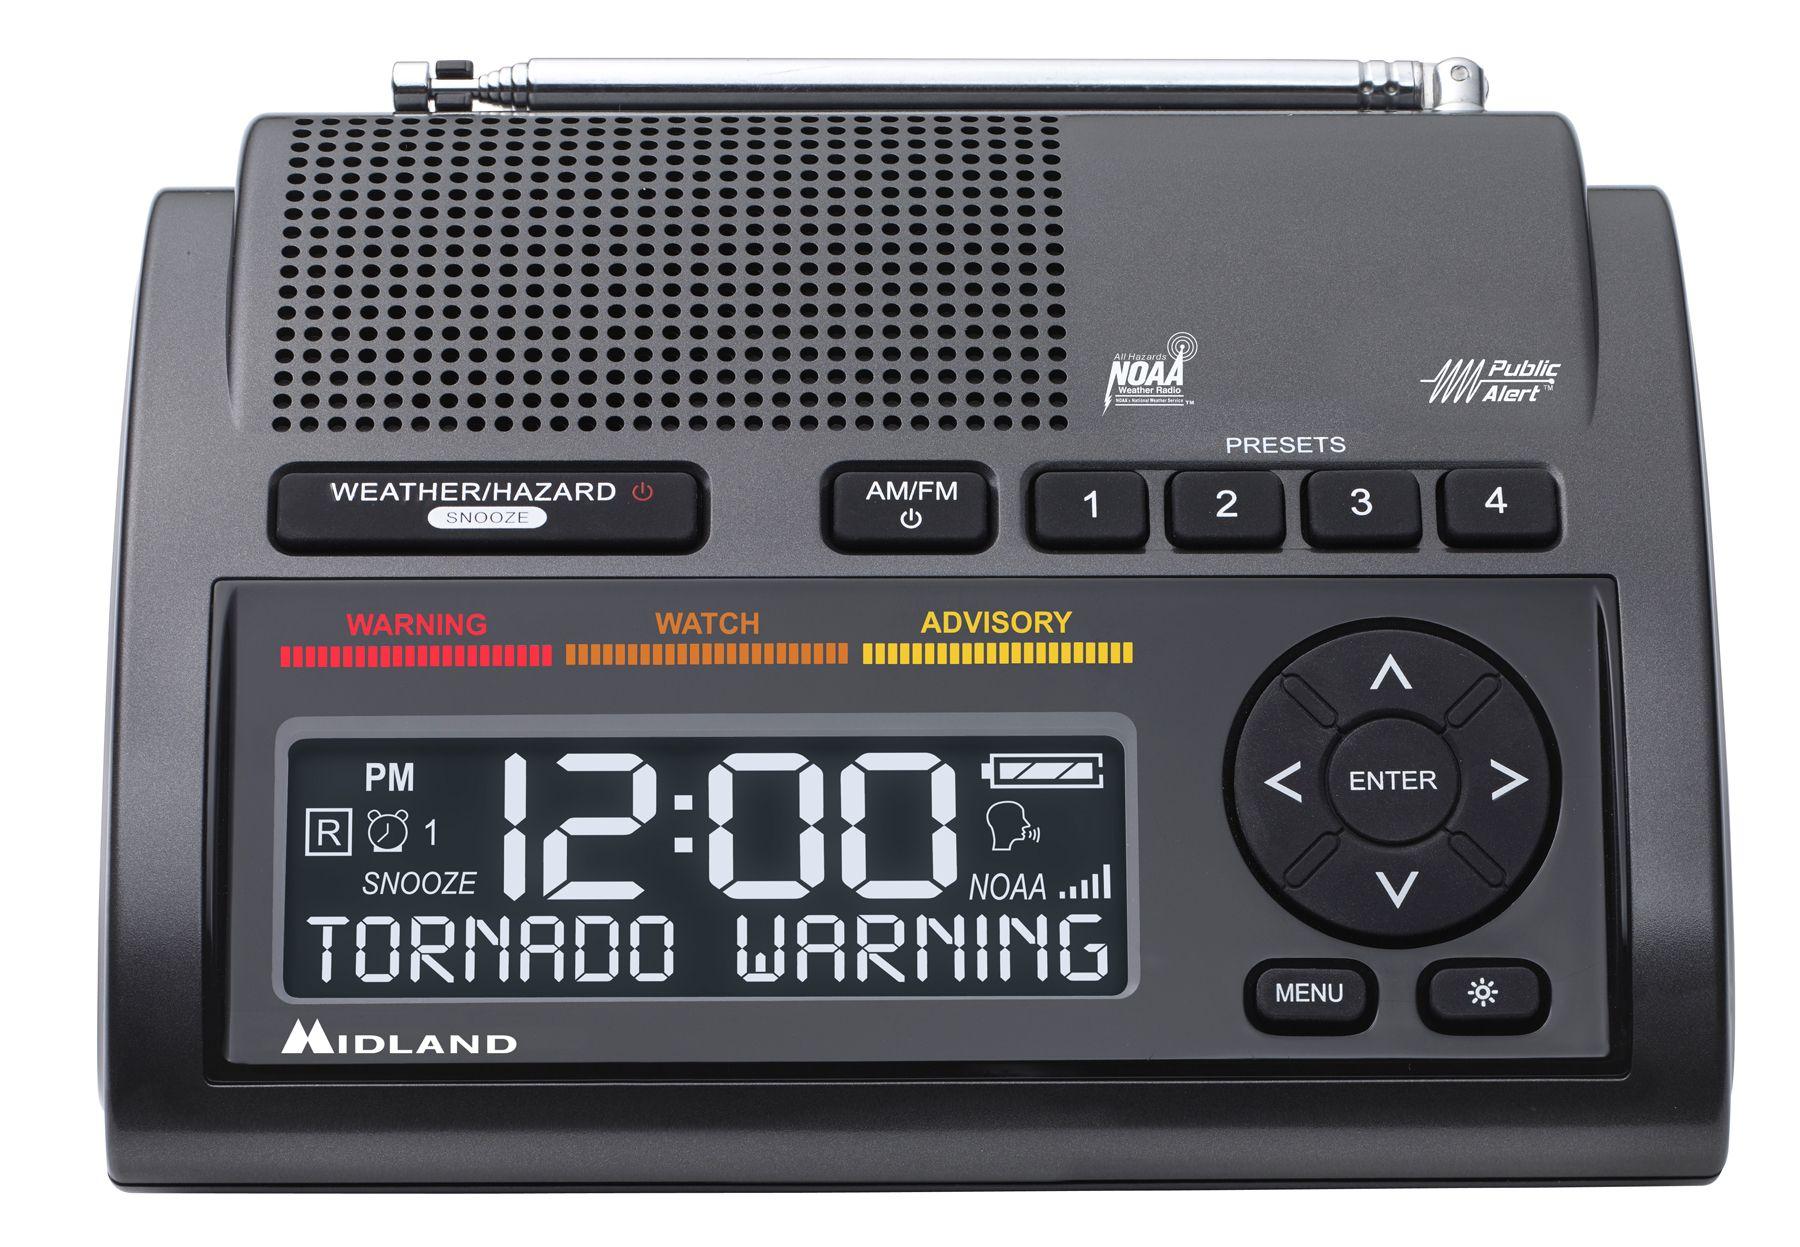 Midland Radio Wr400 Deluxe Noaa Weather Radio Noaa Weather Radio Weather Radio Weather Alerts